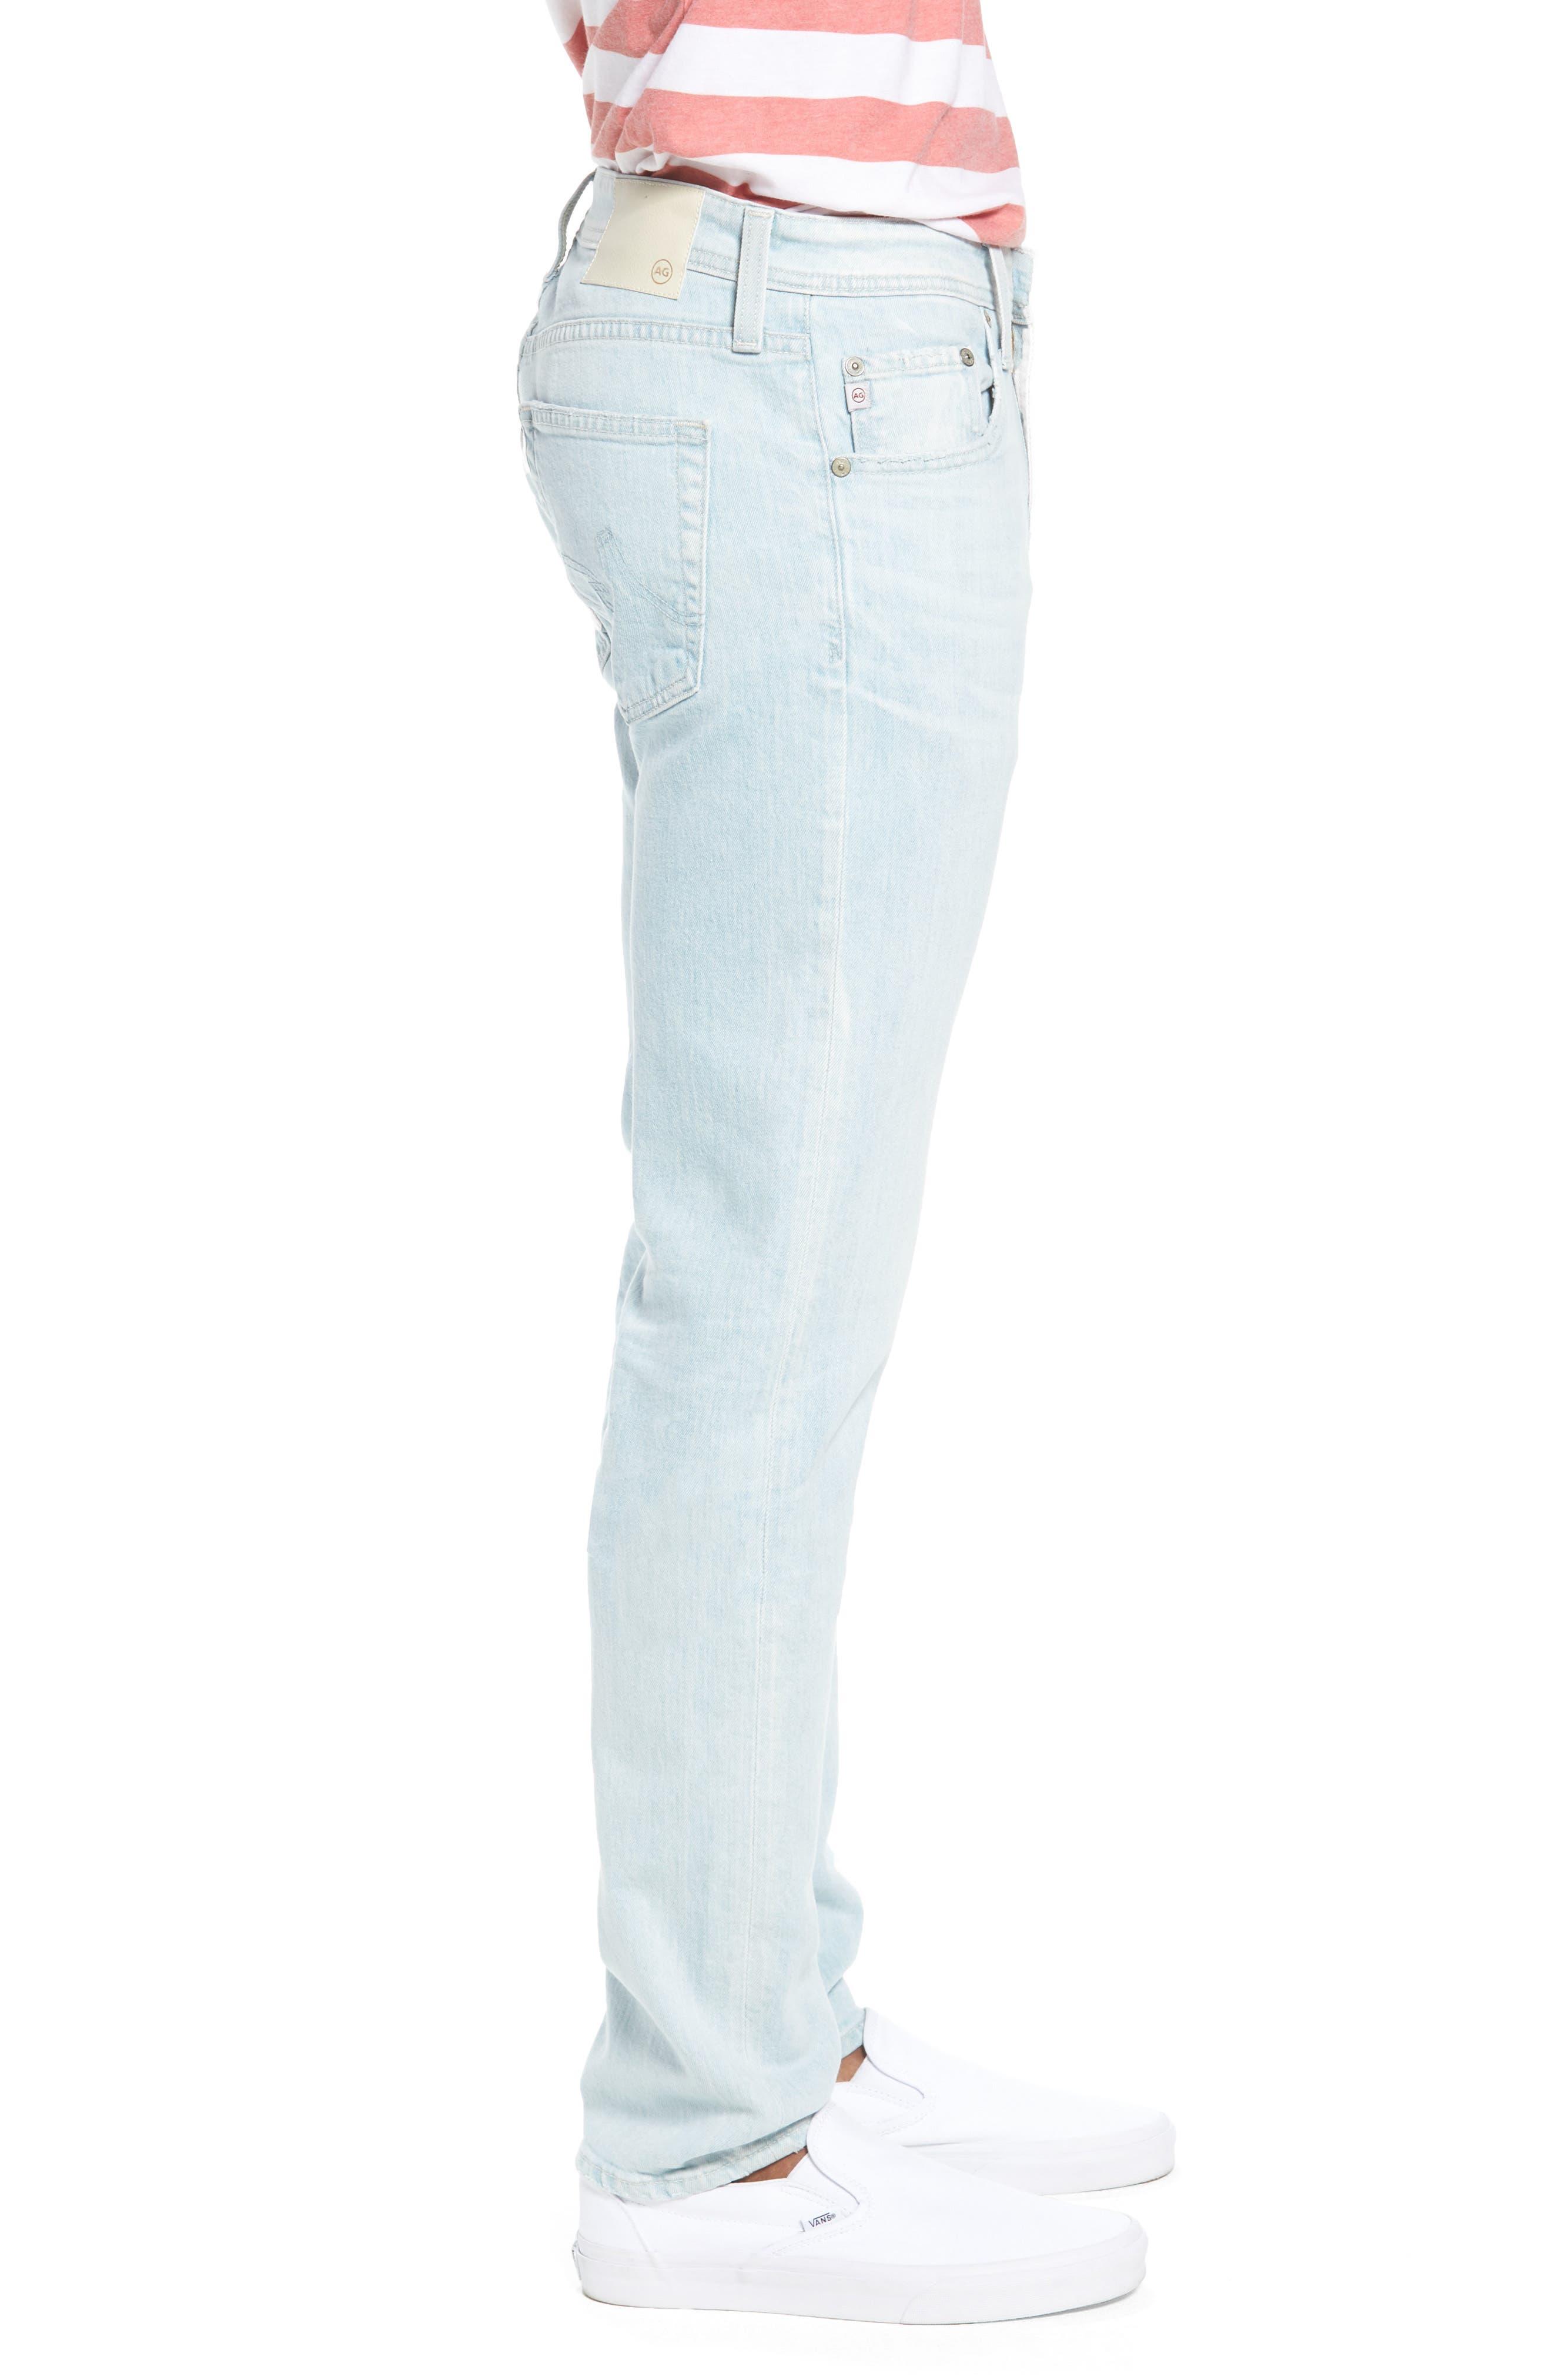 Dylan Skinny Fit Jeans,                             Alternate thumbnail 3, color,                             28 Years Salt Mist